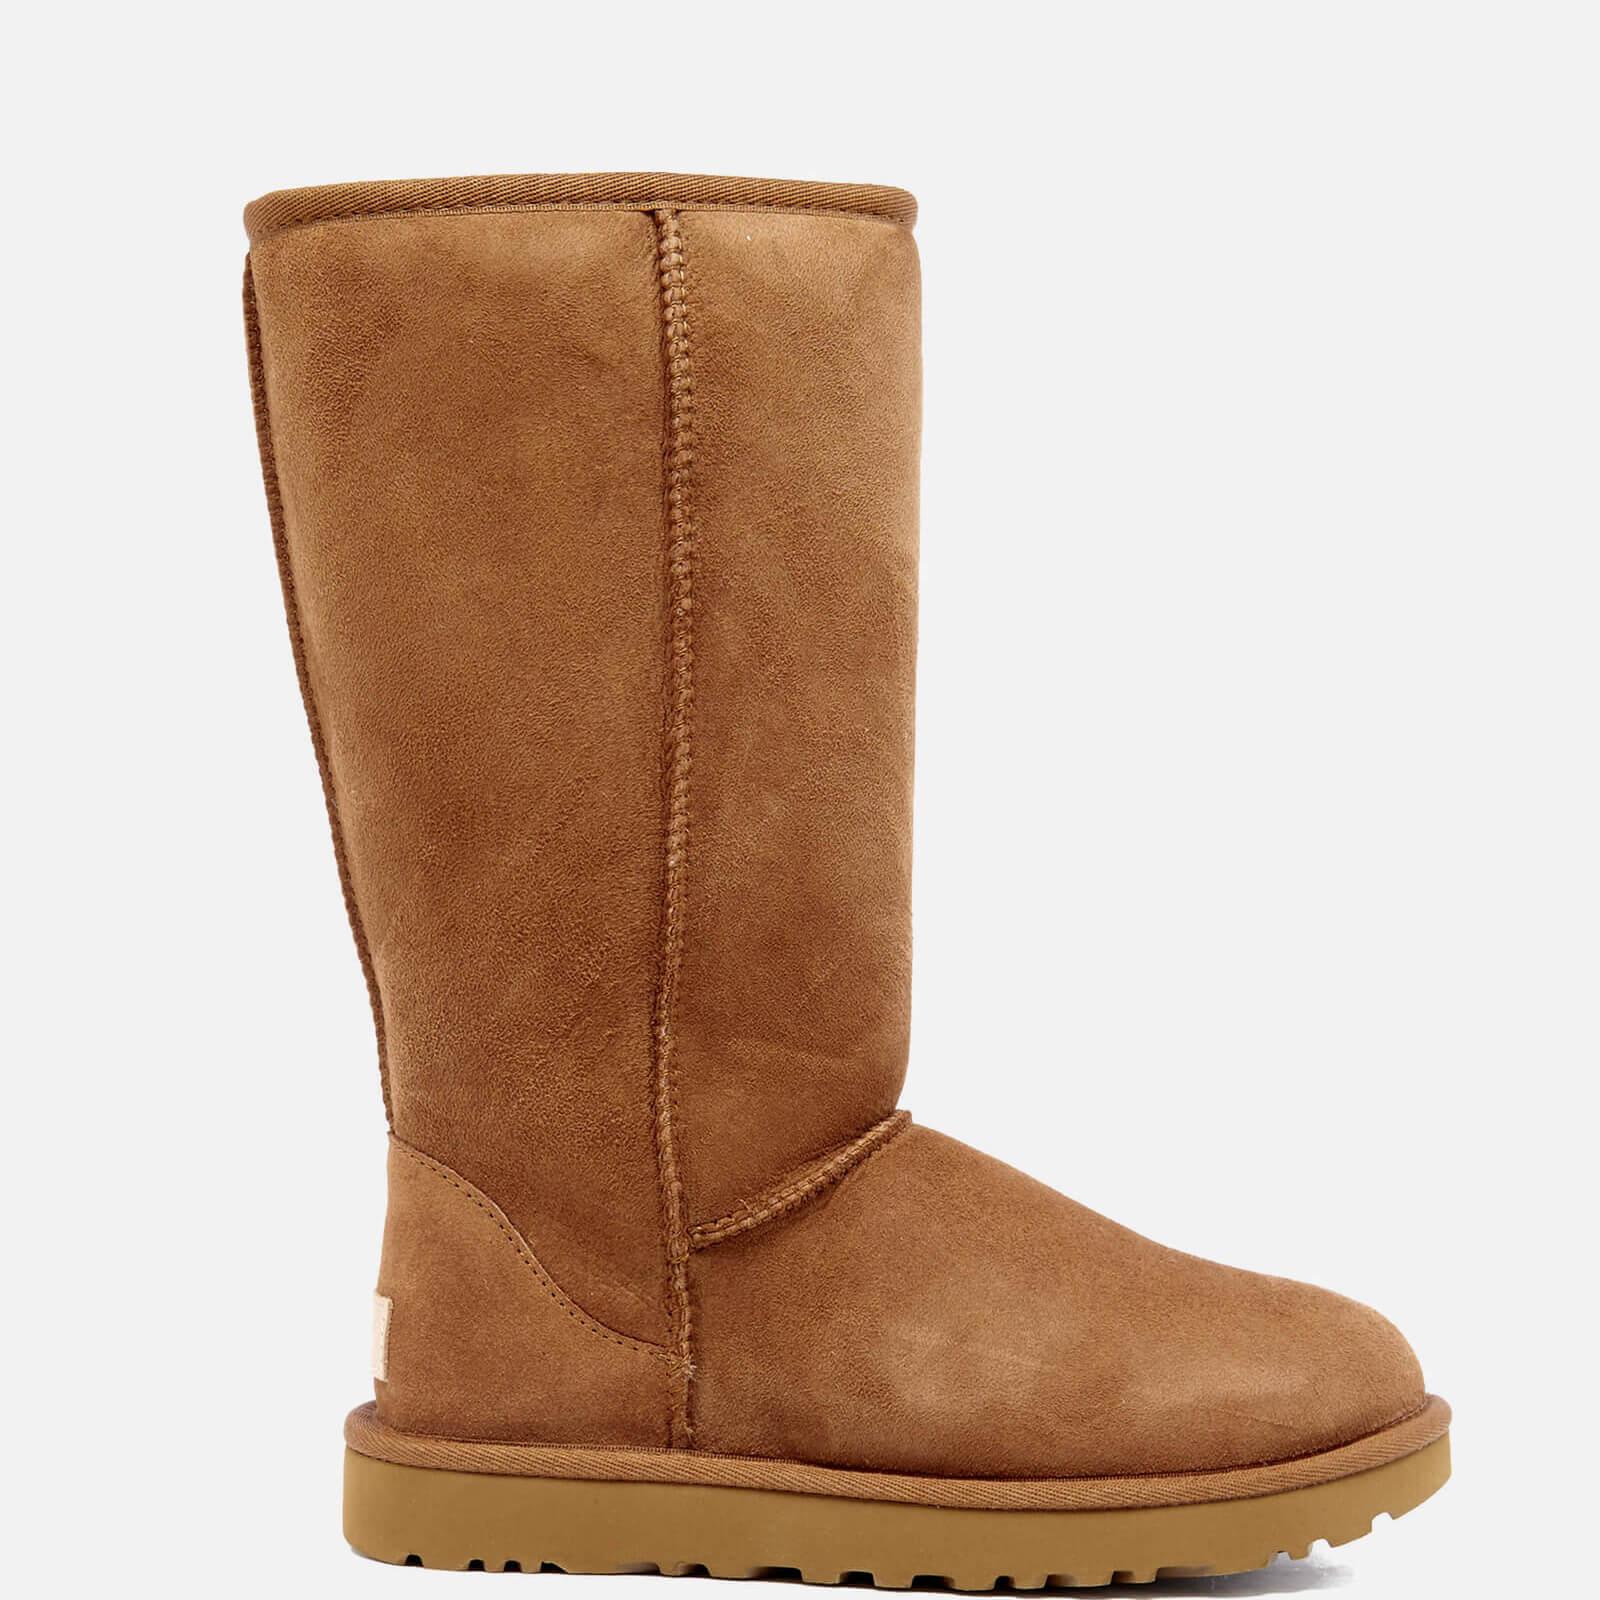 UGG Women's Classic Tall II Sheepskin Boots - Chestnut - UK 4.5